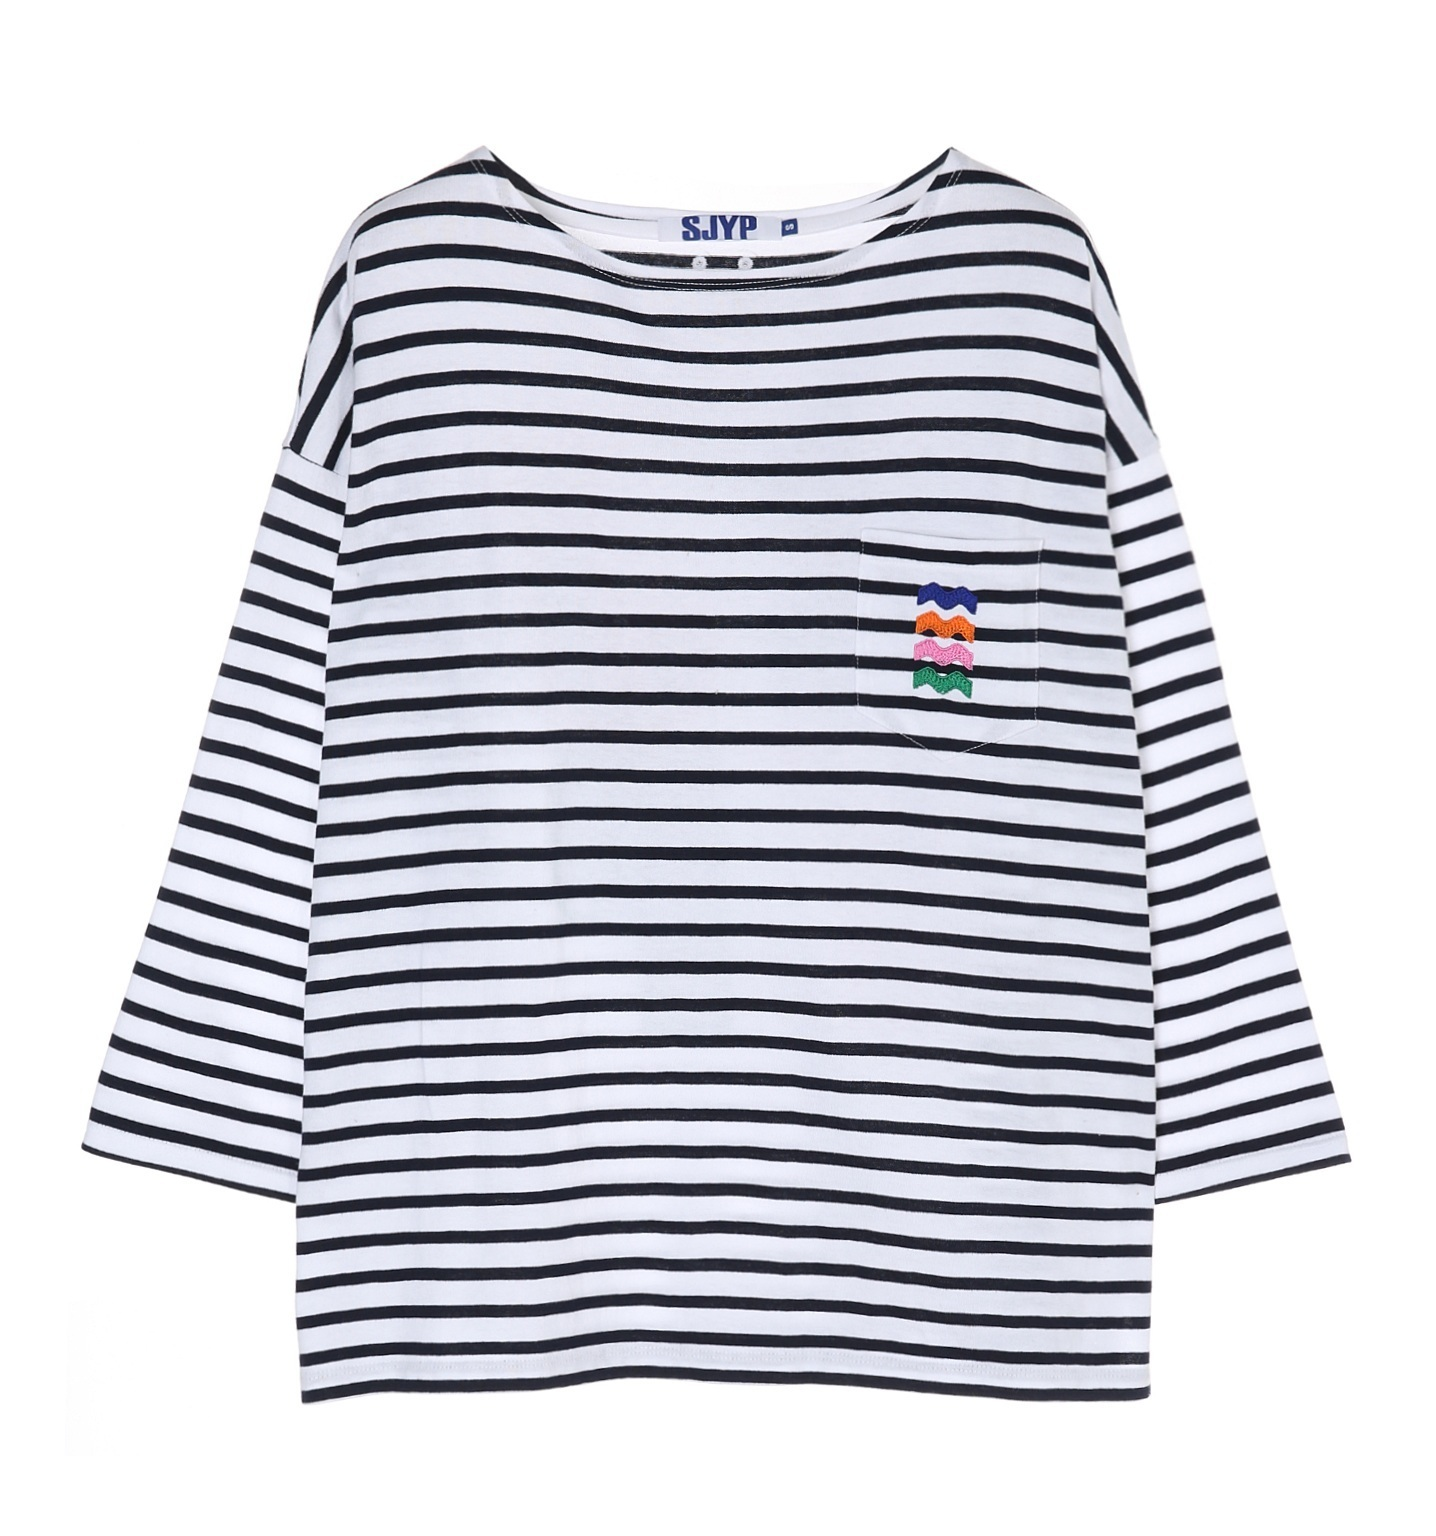 sjyp dhl secured shipping sjyp striped t shirt navy buyma. Black Bedroom Furniture Sets. Home Design Ideas